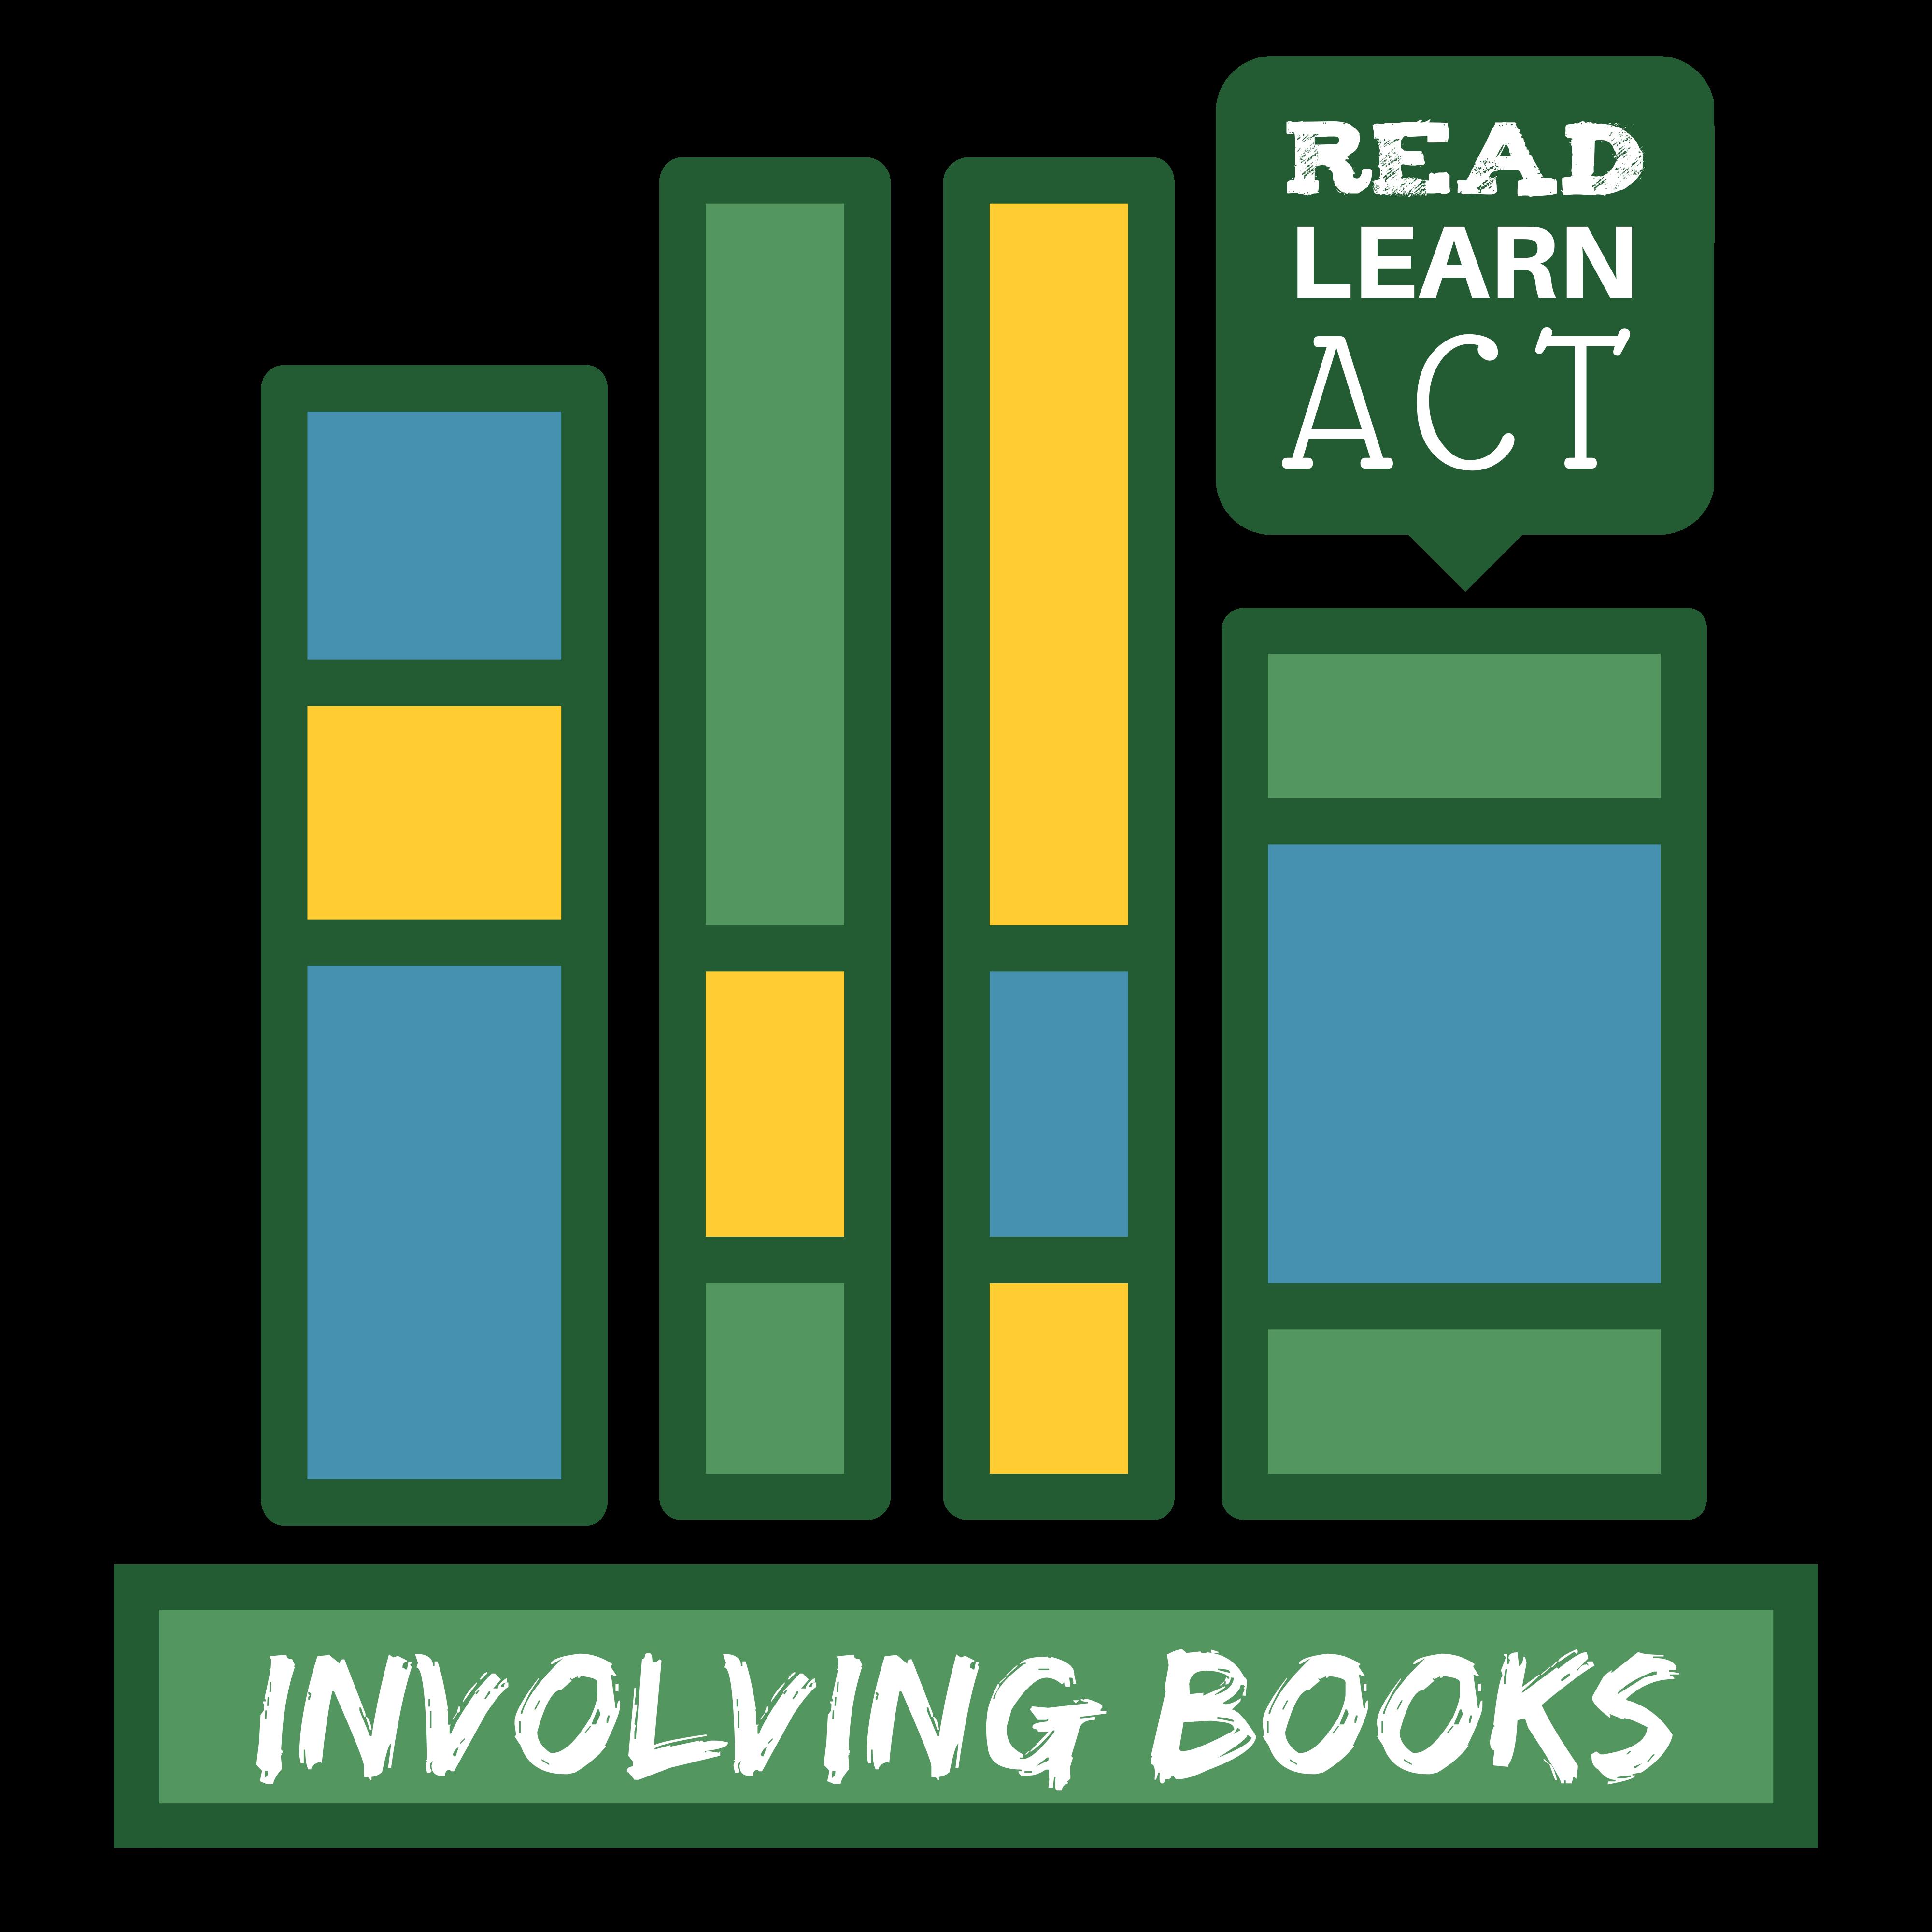 involving-books-logo-read-learn-act